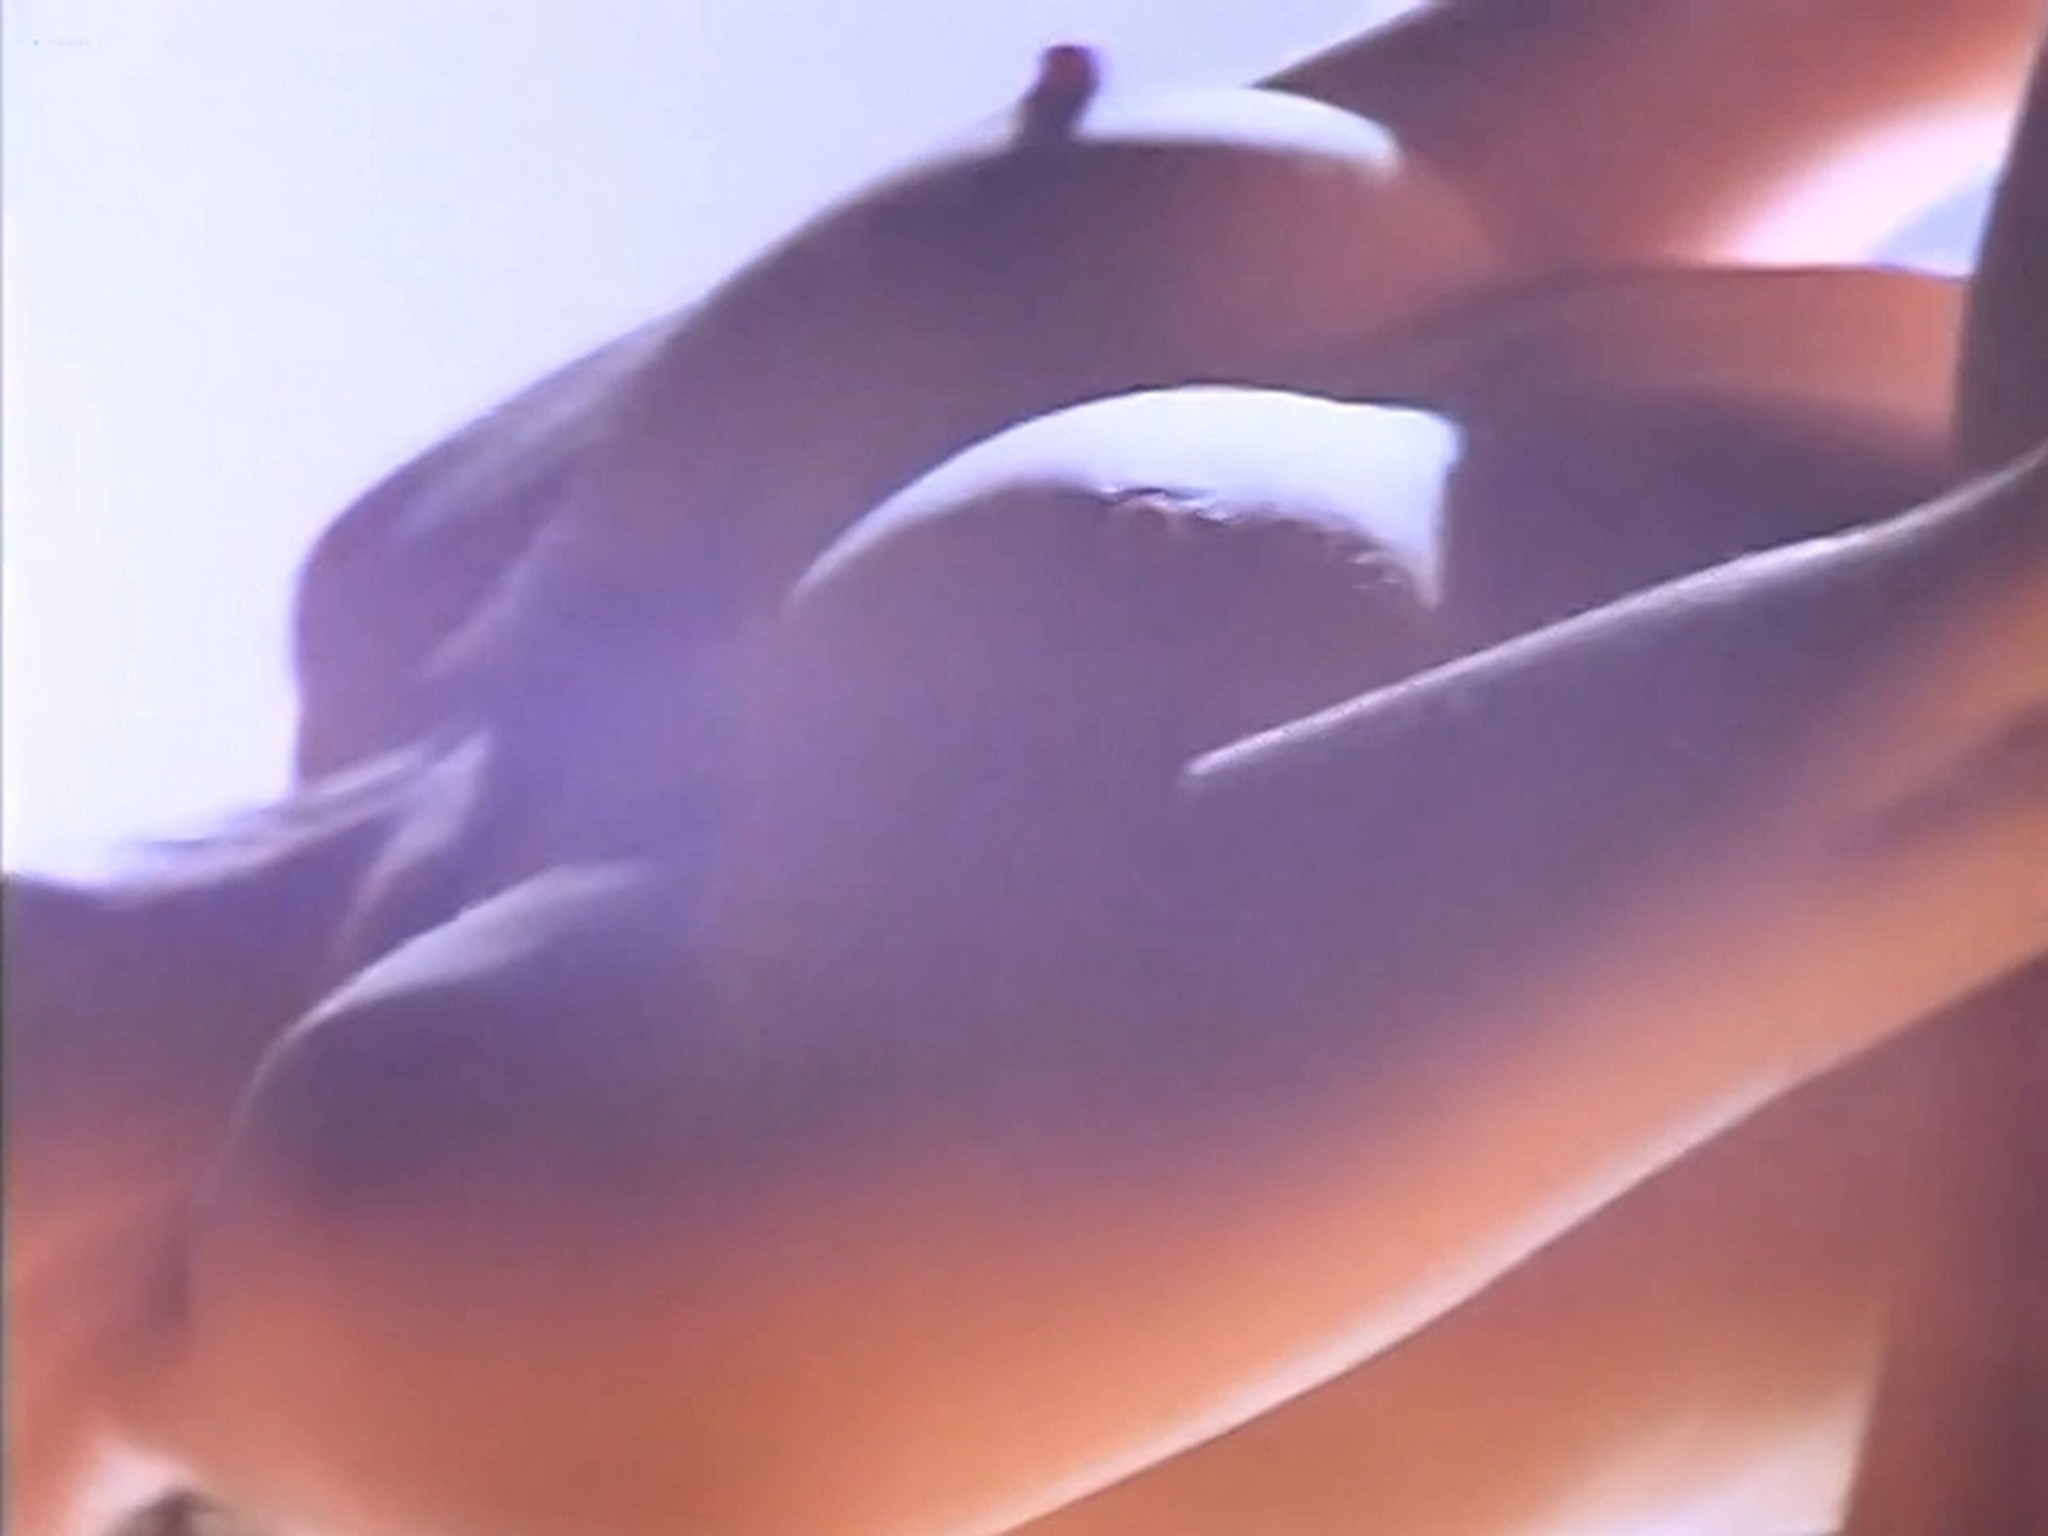 Neith Hunter nude Jennifer Burton Sue Kiel nude sex Red Shoe Diaries How I Met My Husband 1992 s1e13 10